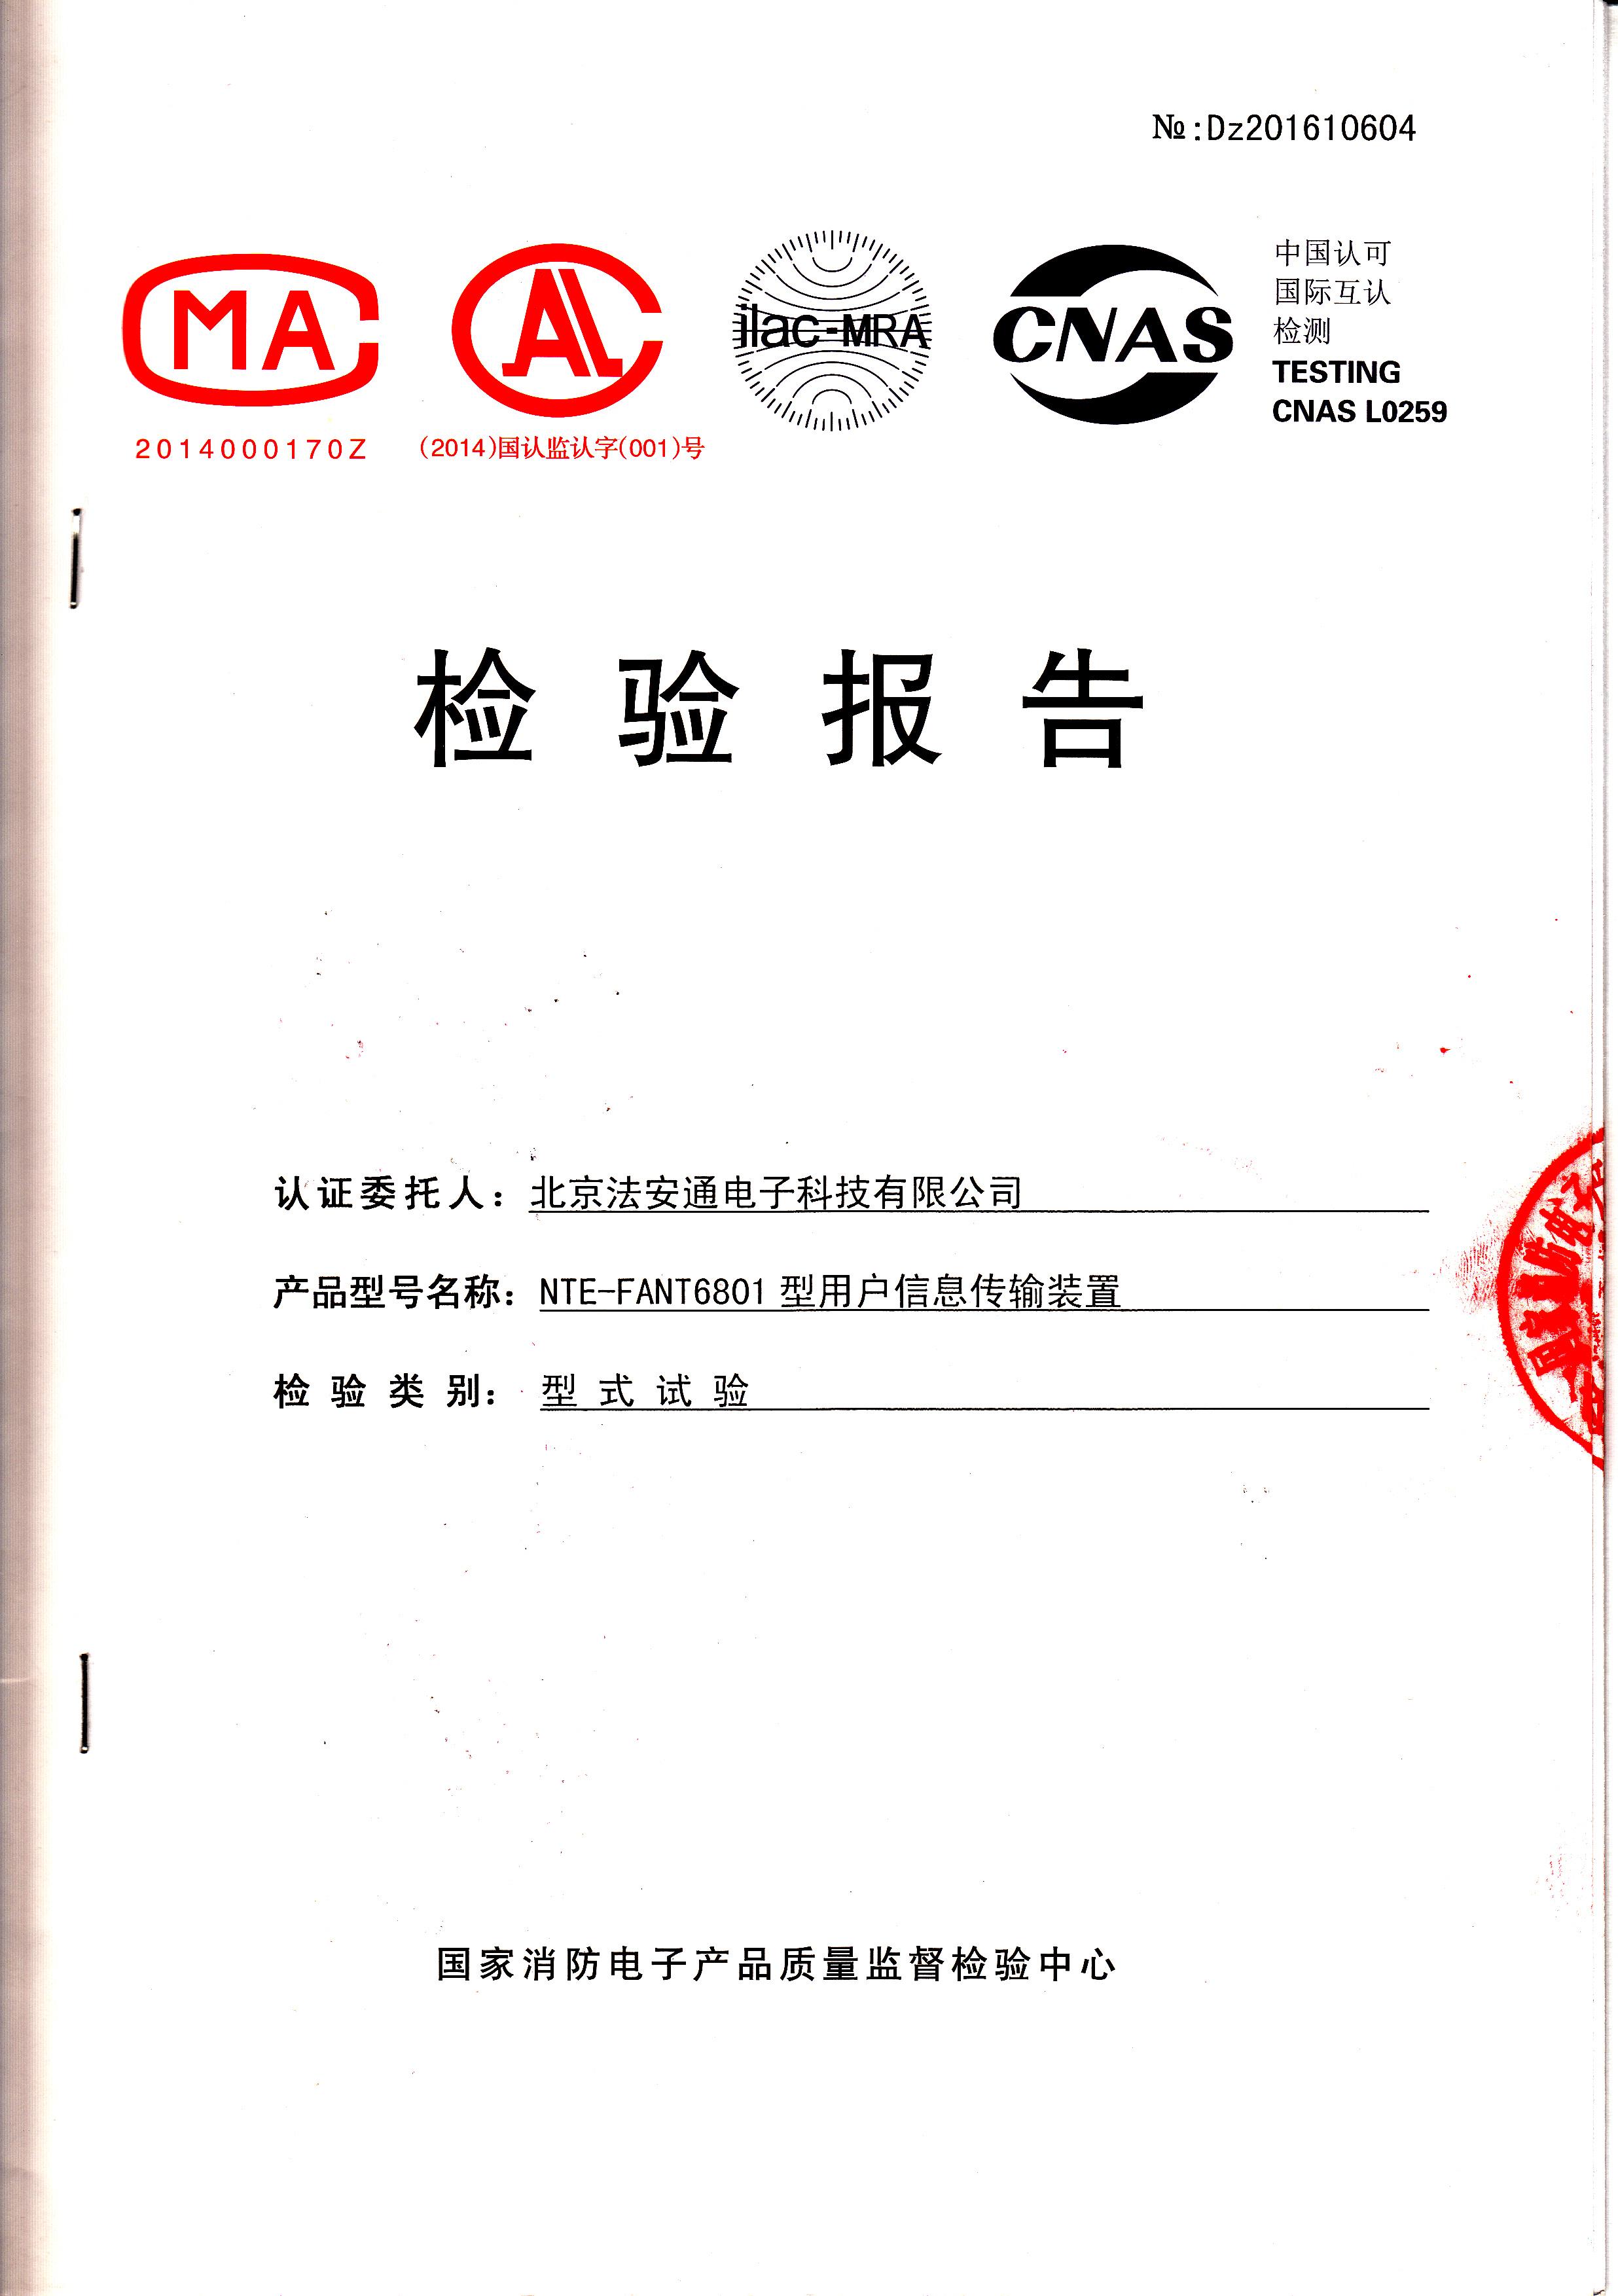 NTE-FANT6801-用户信息传输装置